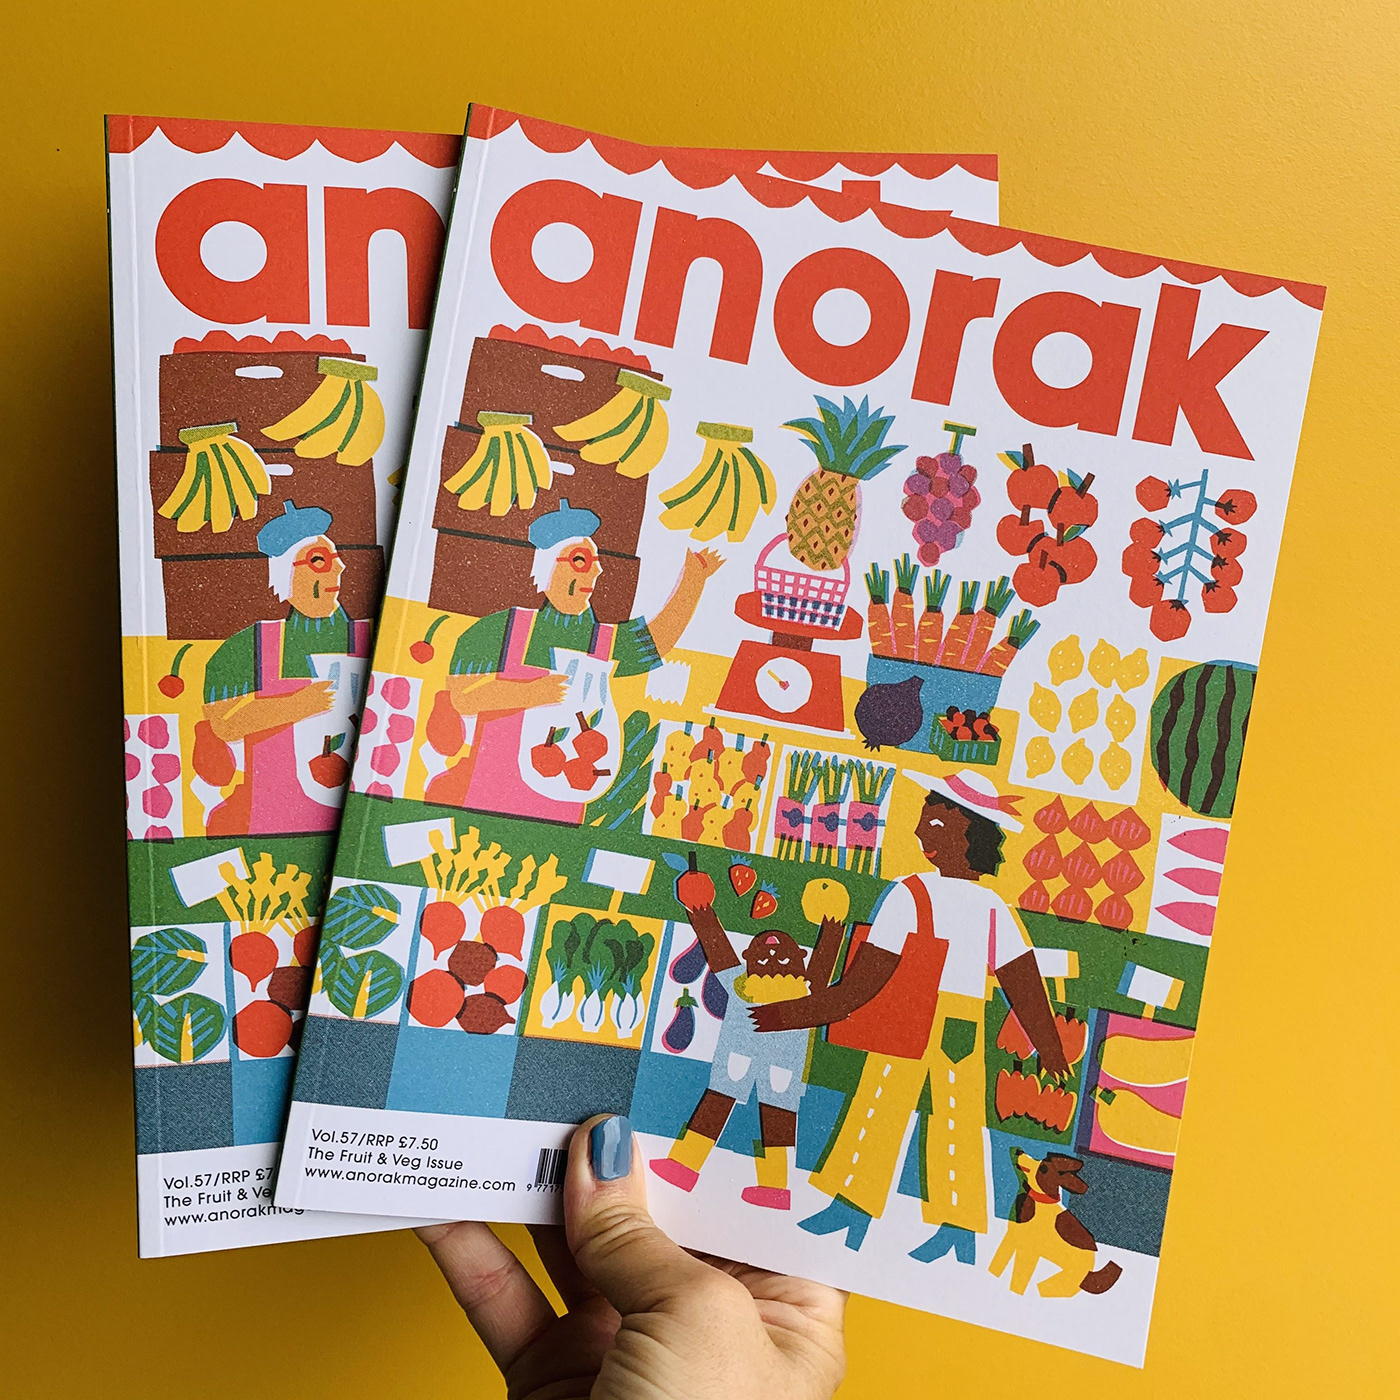 Thumbnail for Asahi Nagata's Anorak Magazine Cover Will Inspire You to Eat Your Fruits and Veggies